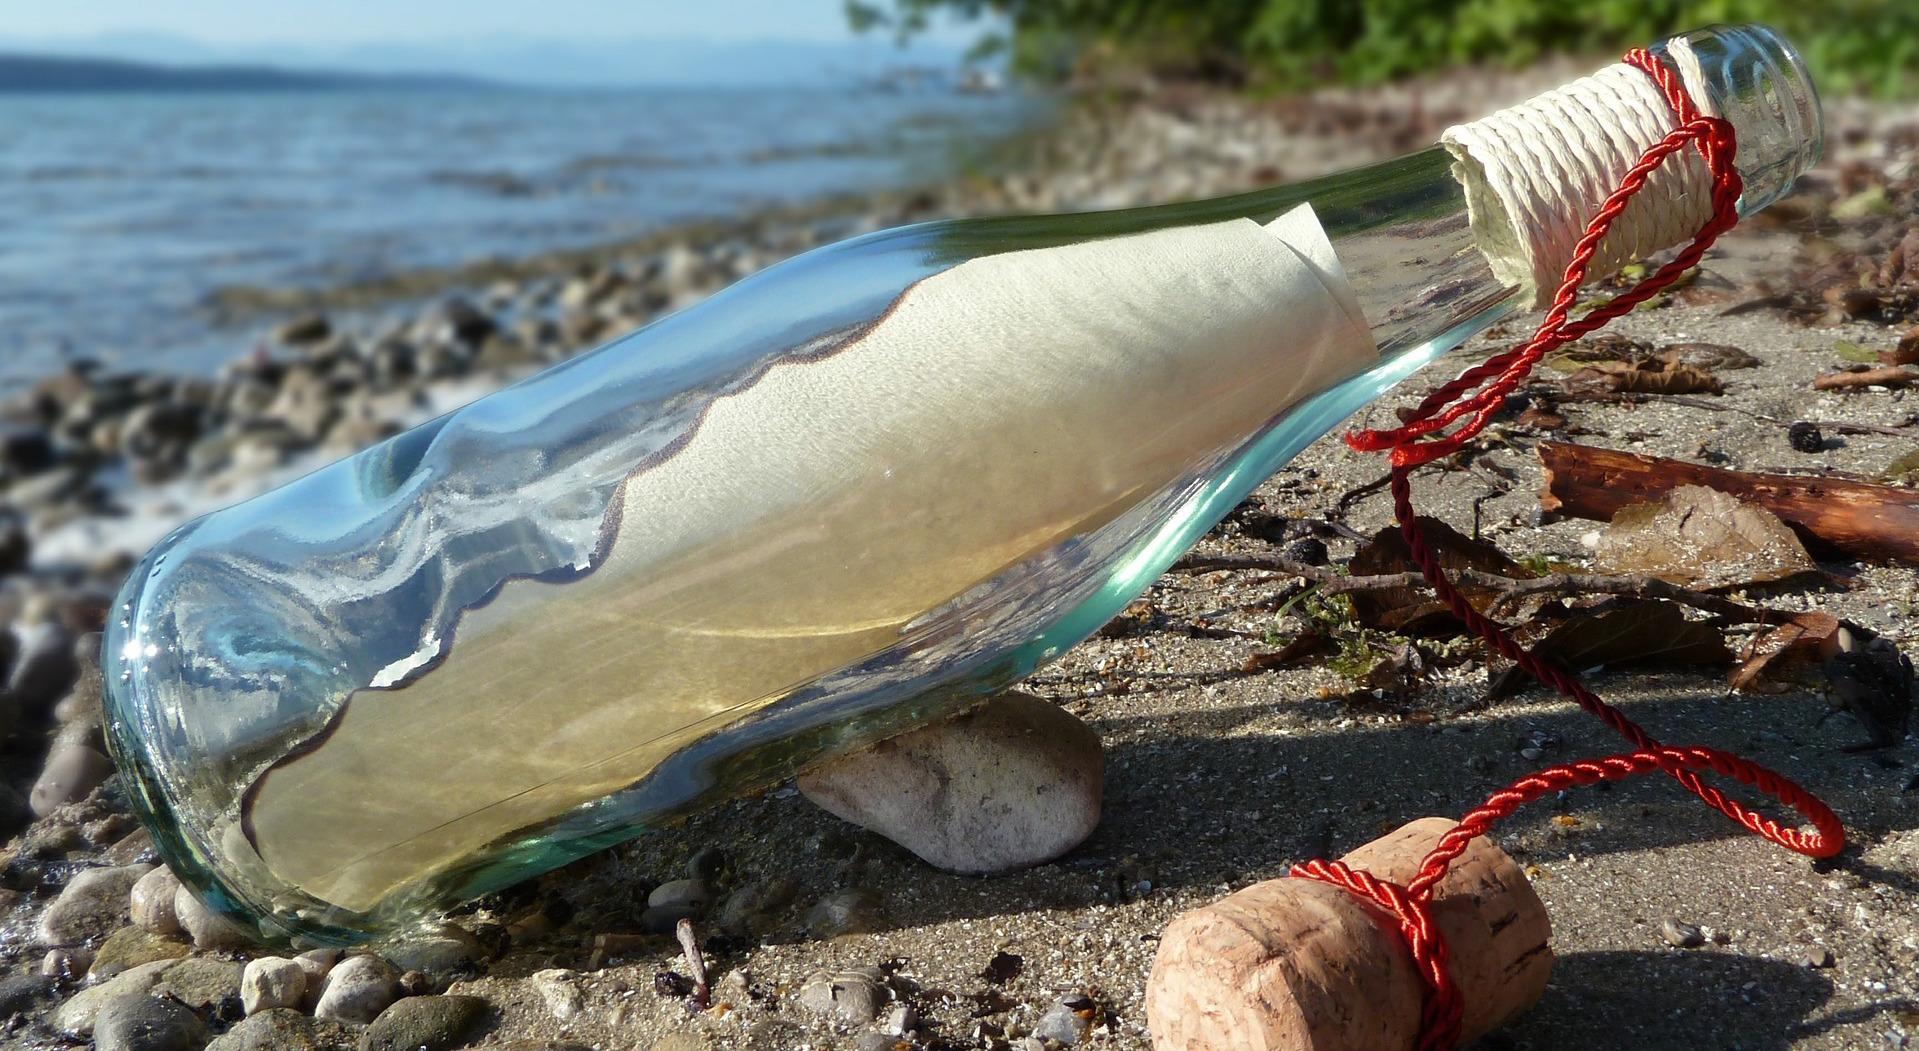 message-in-a-bottle-413680_1920